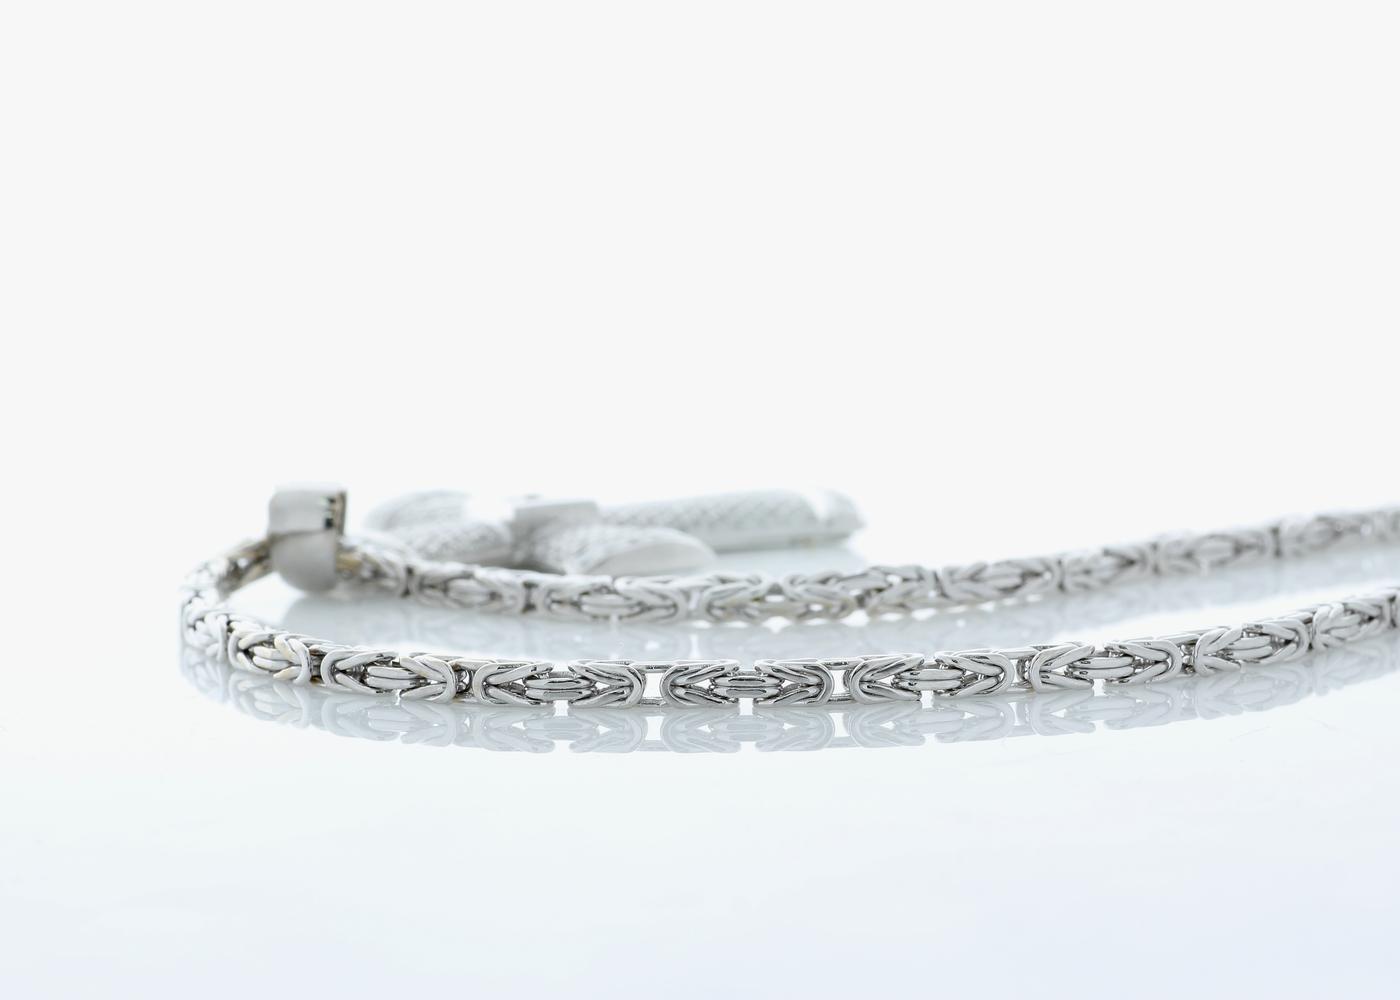 Lot 37 - 18ct White Gold Diamond Cross Pendant and Chain 5.12 Carats Carats